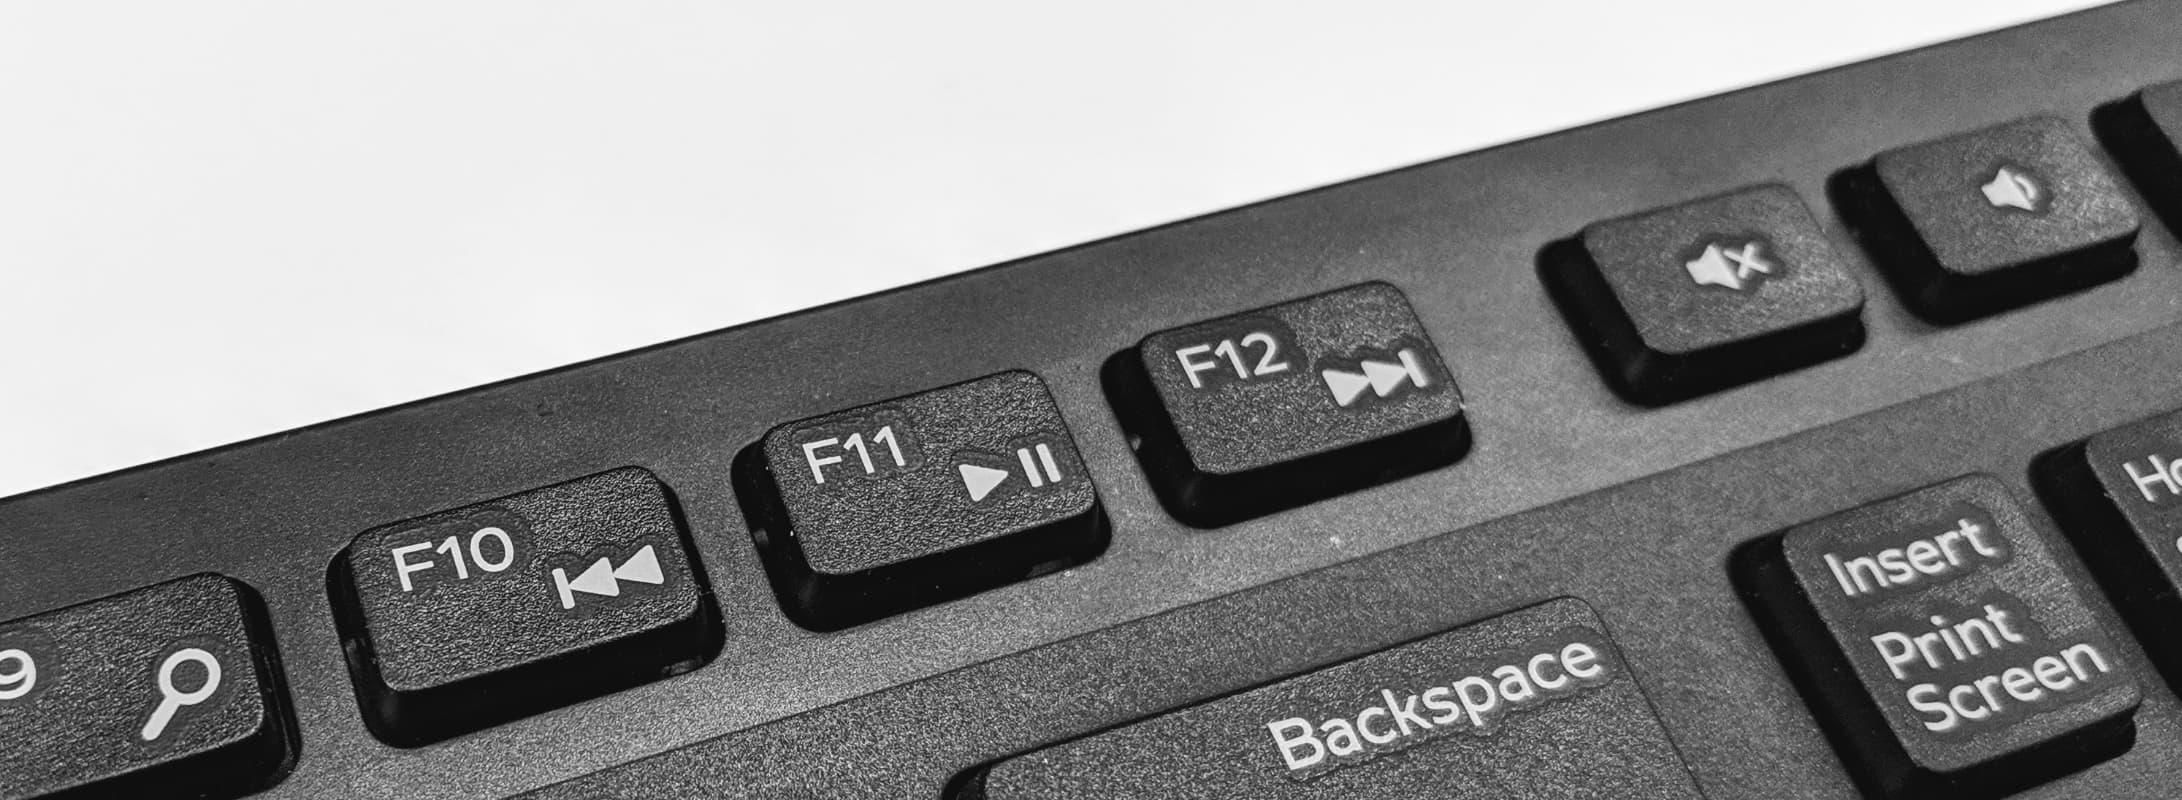 Keyboard media keys